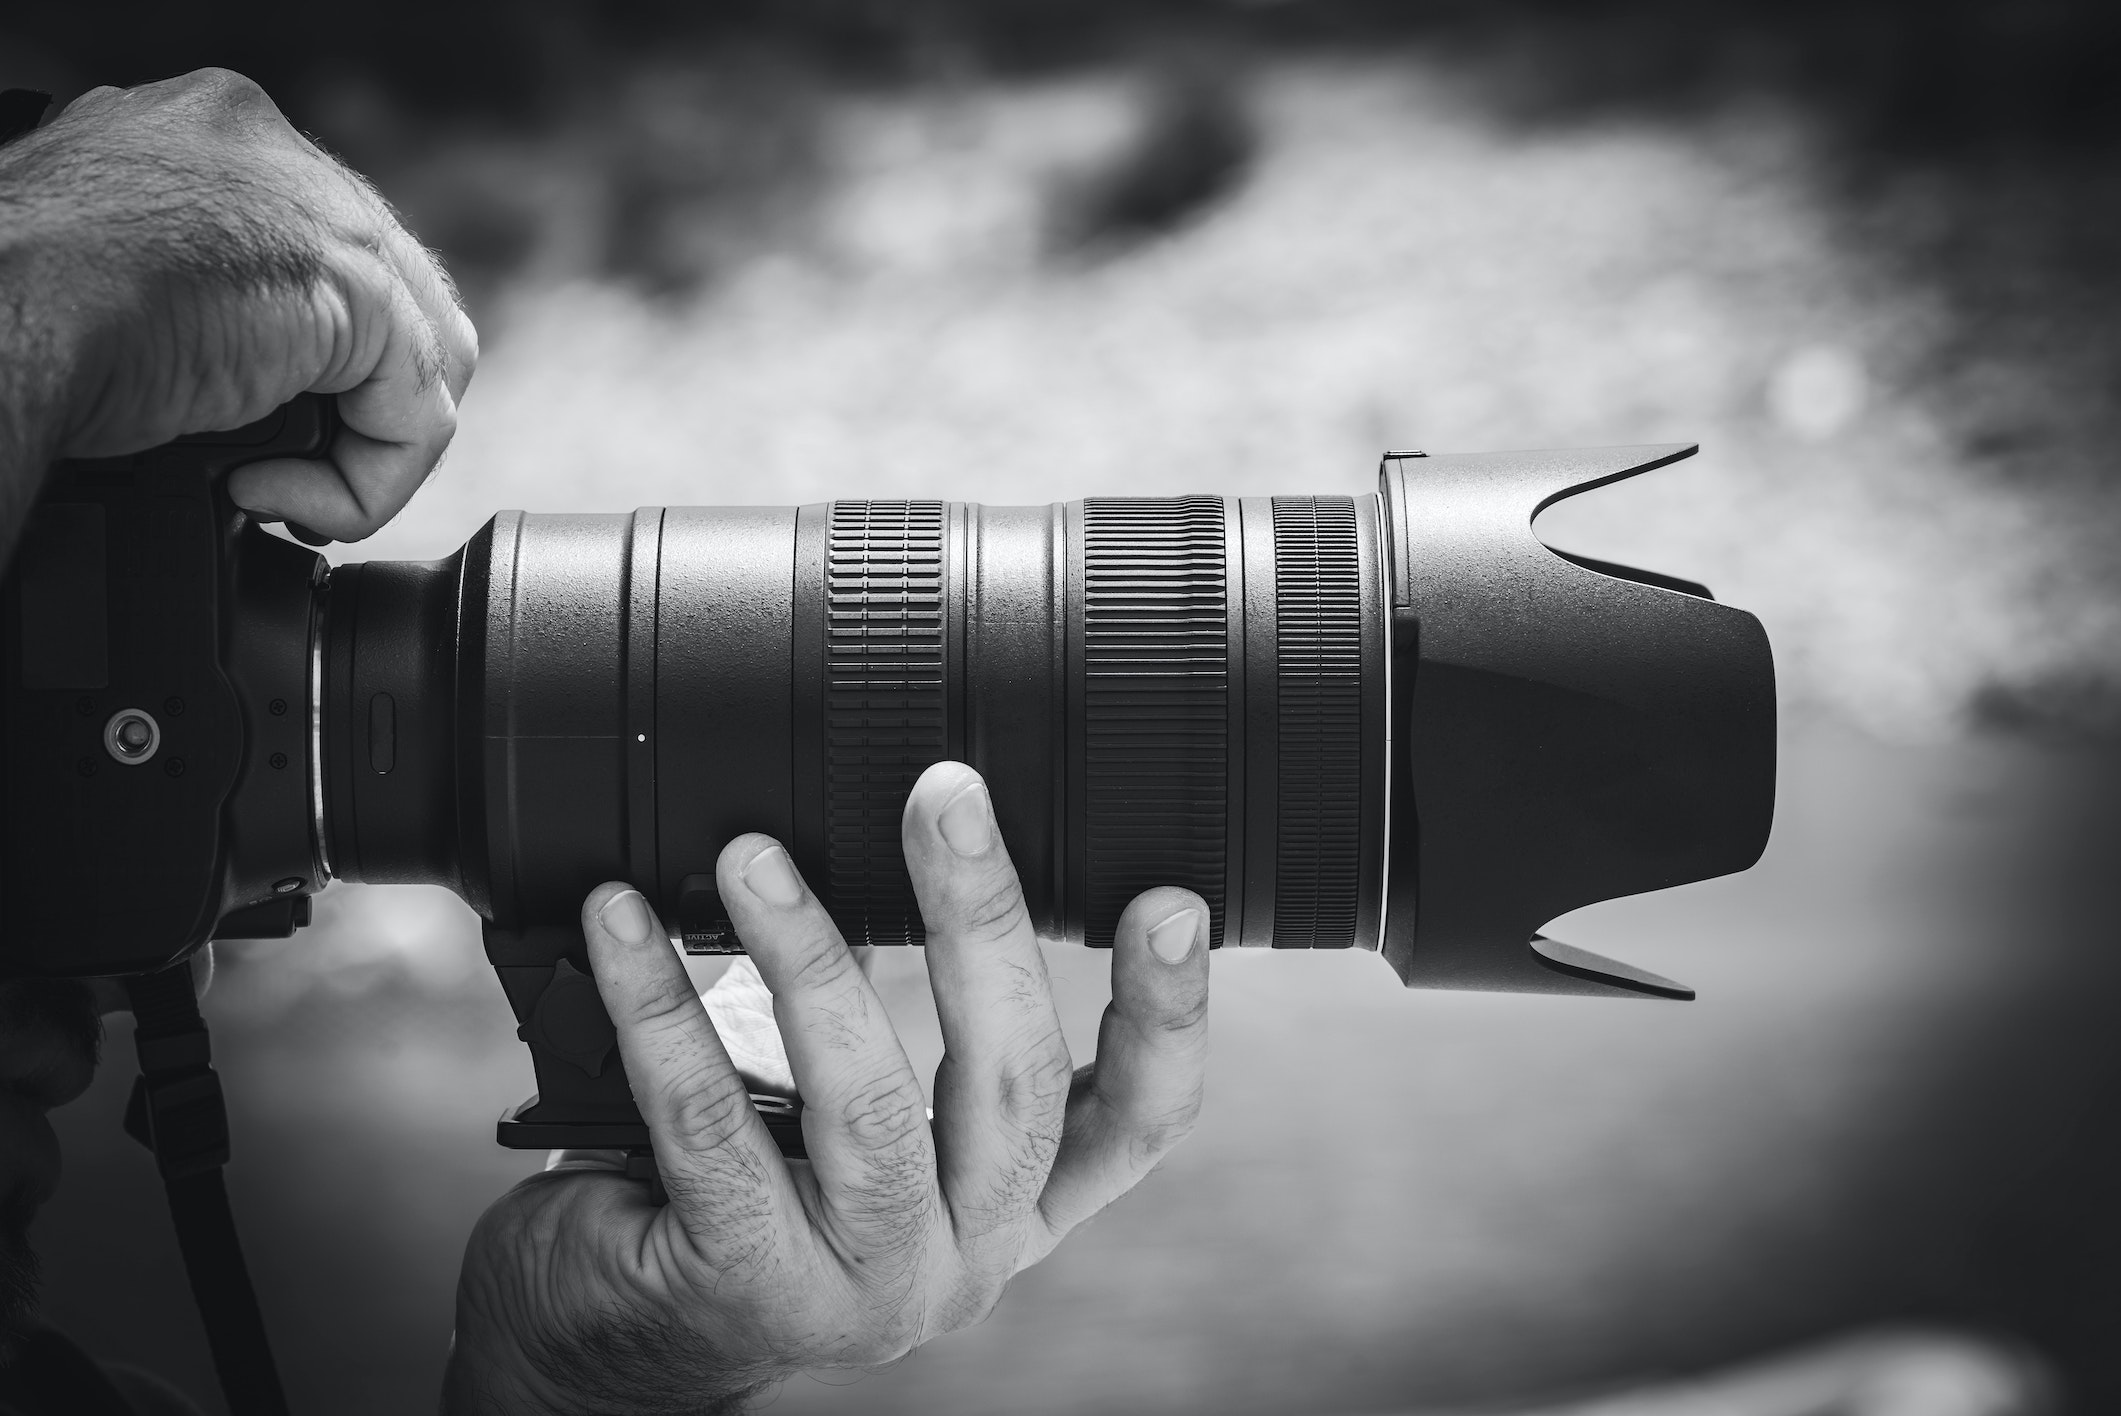 DSLR camera lens example